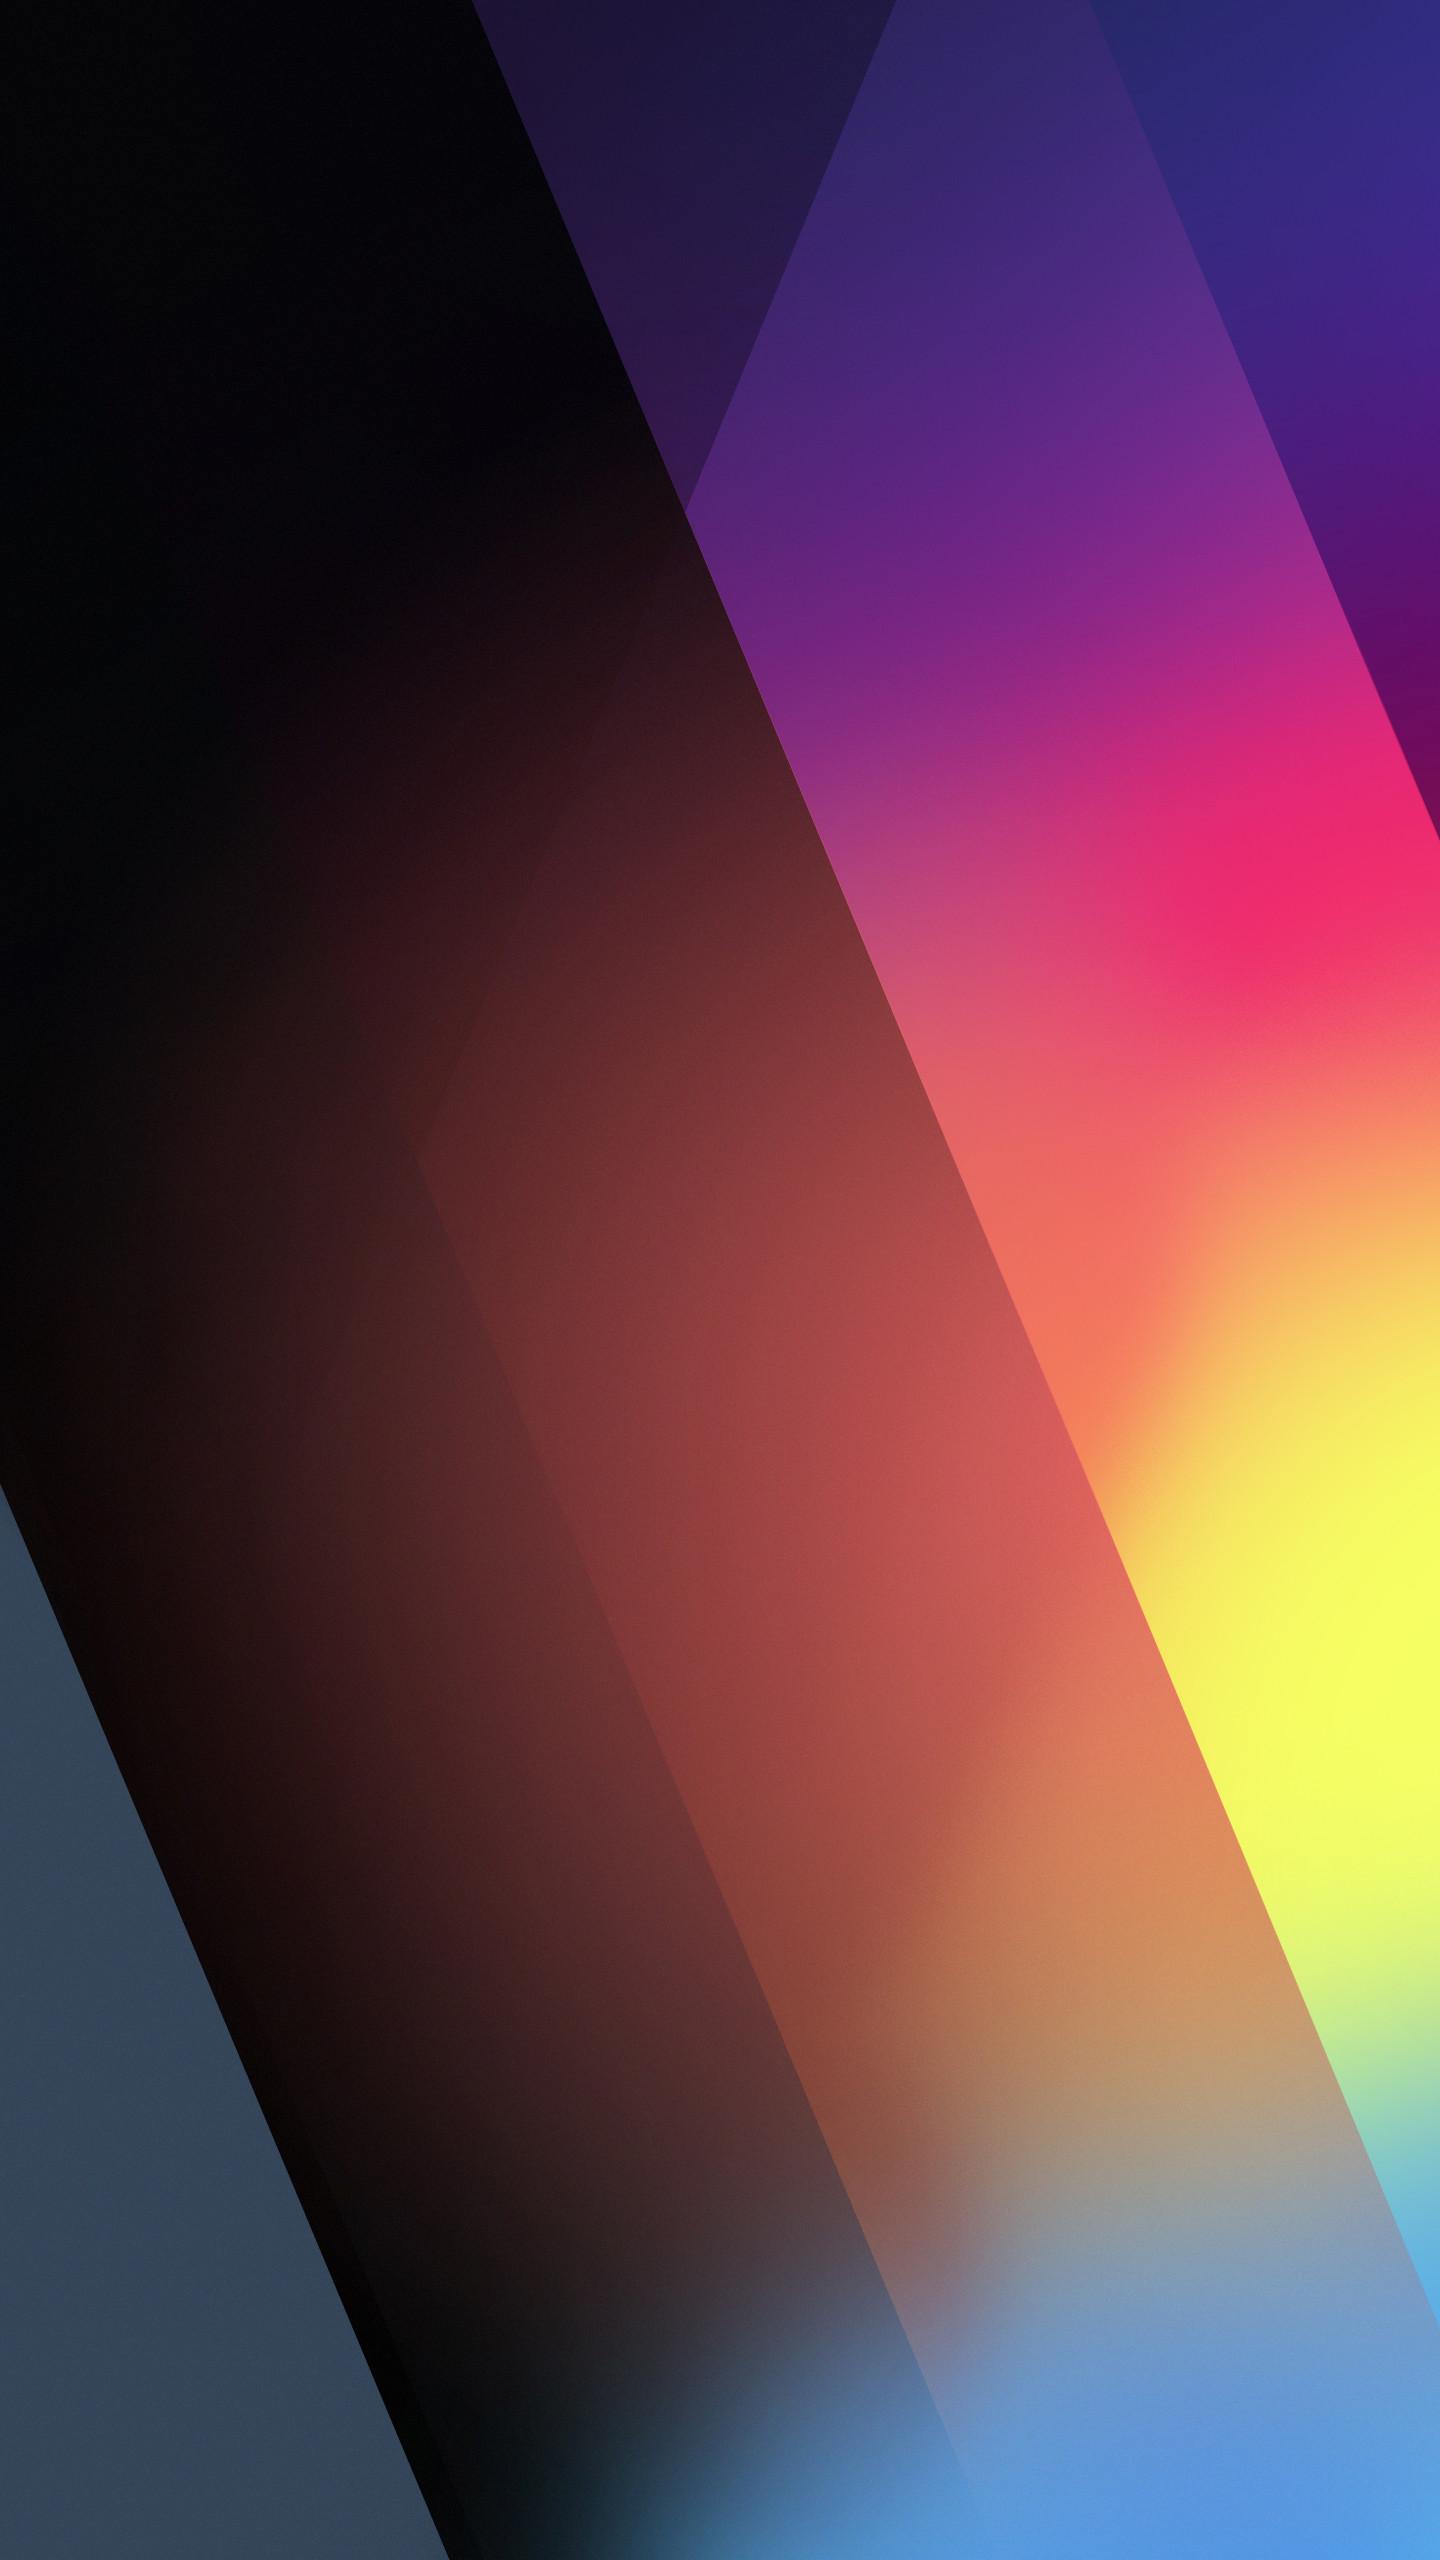 Lg Logo Wallpaper Hd ✓ The Galleries of HD Wallpaper